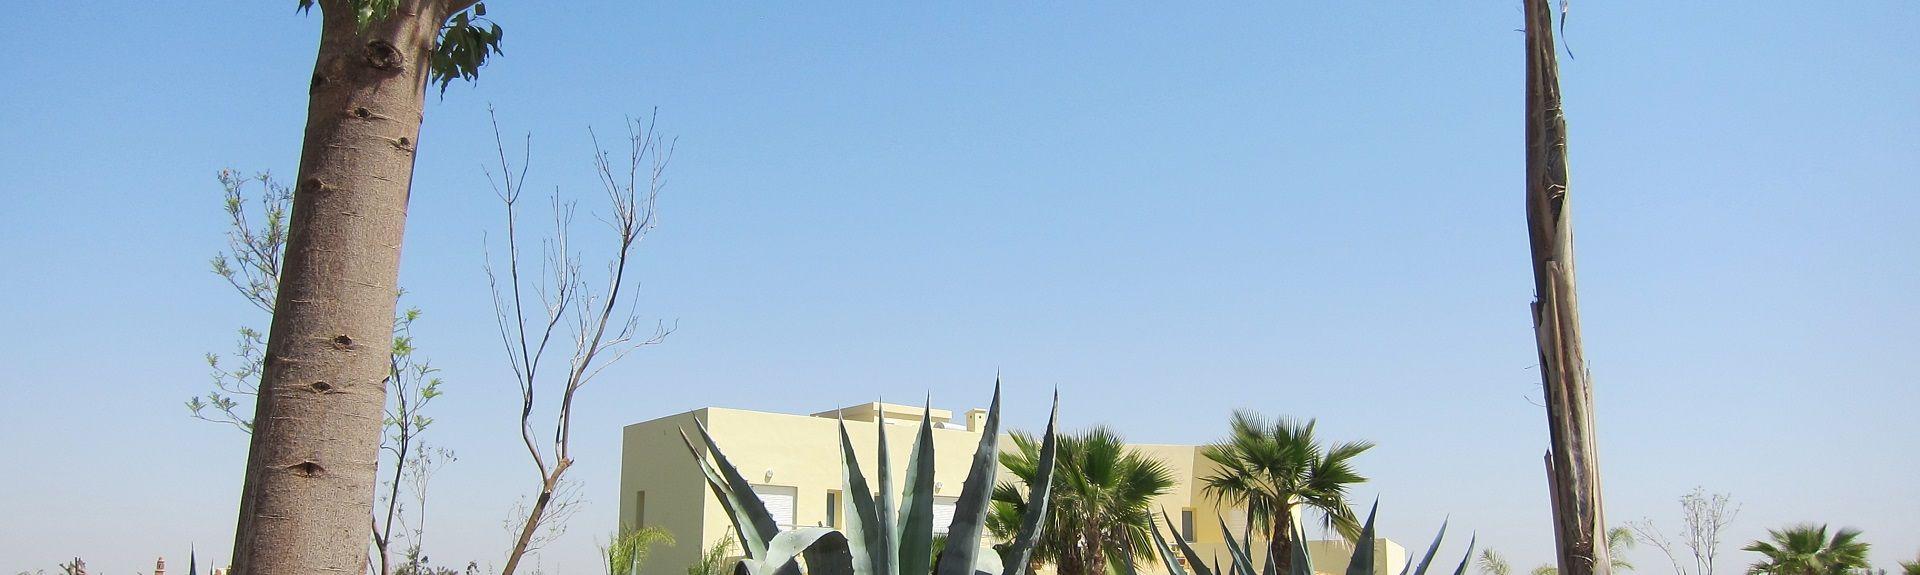 Sidi Abdallah Ghiat, Marrakesh-Tensift-El Haouz, Marrocos